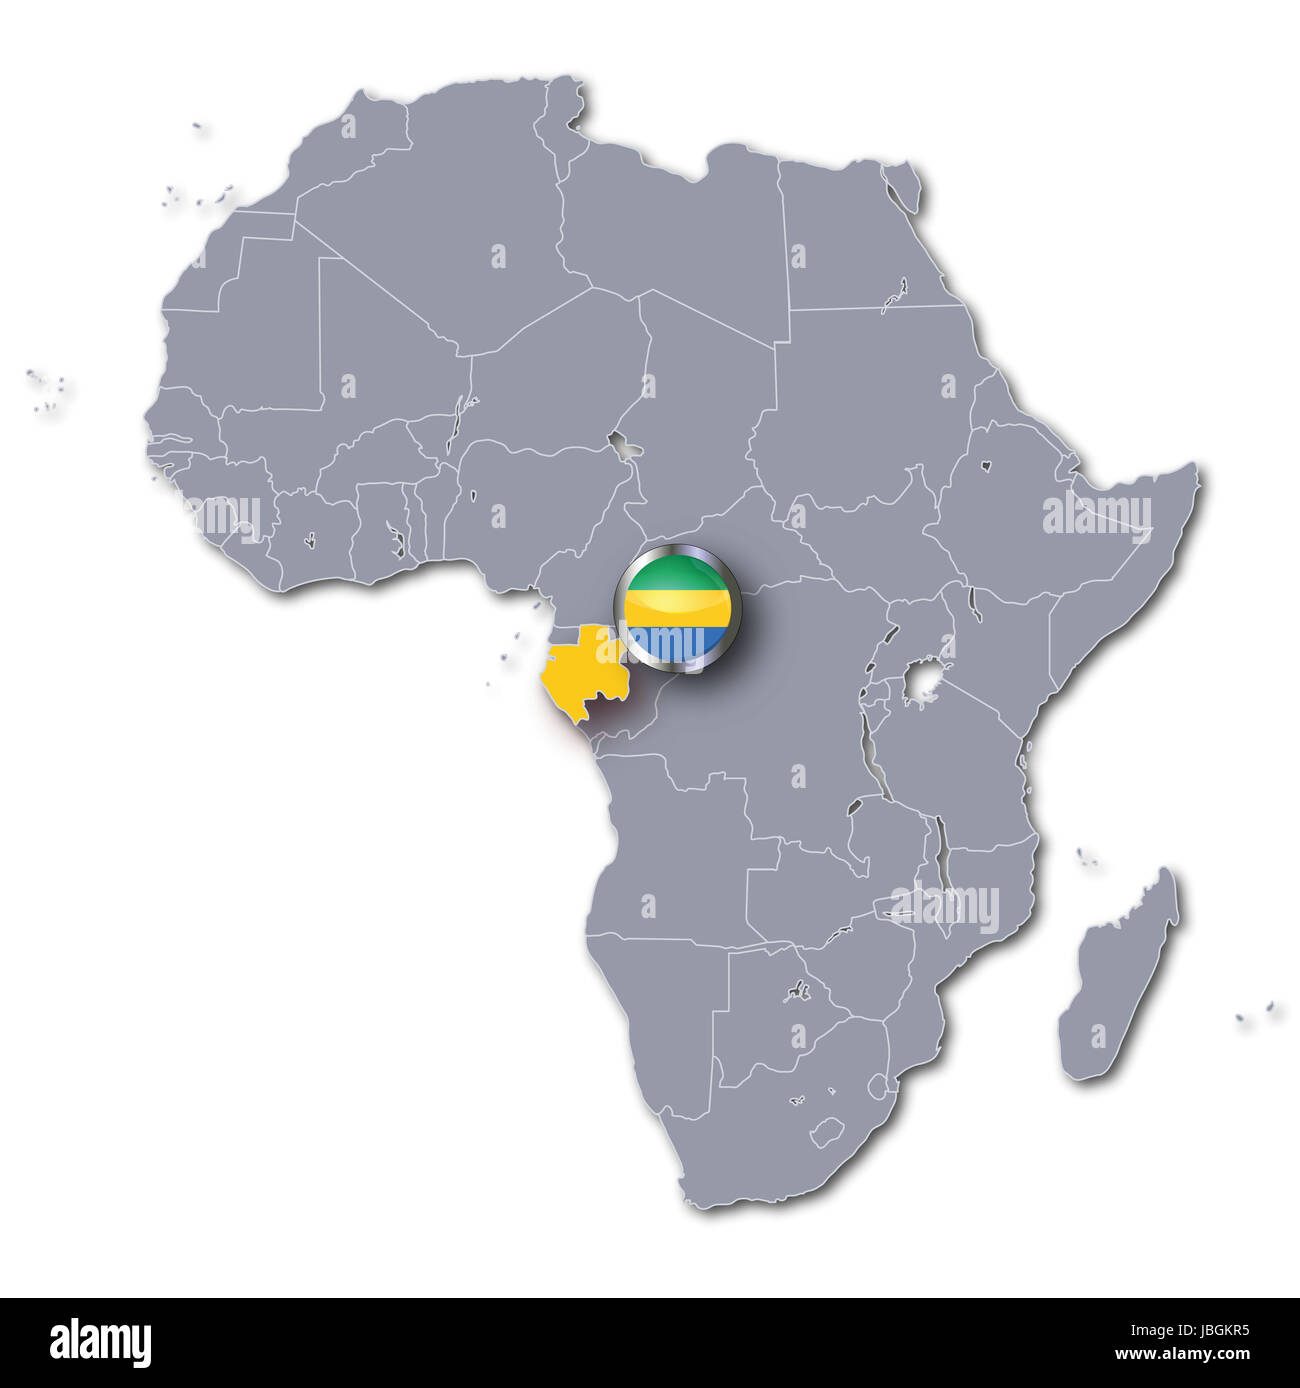 Africa Map Of Gabon Stock Photo 144810937 Alamy